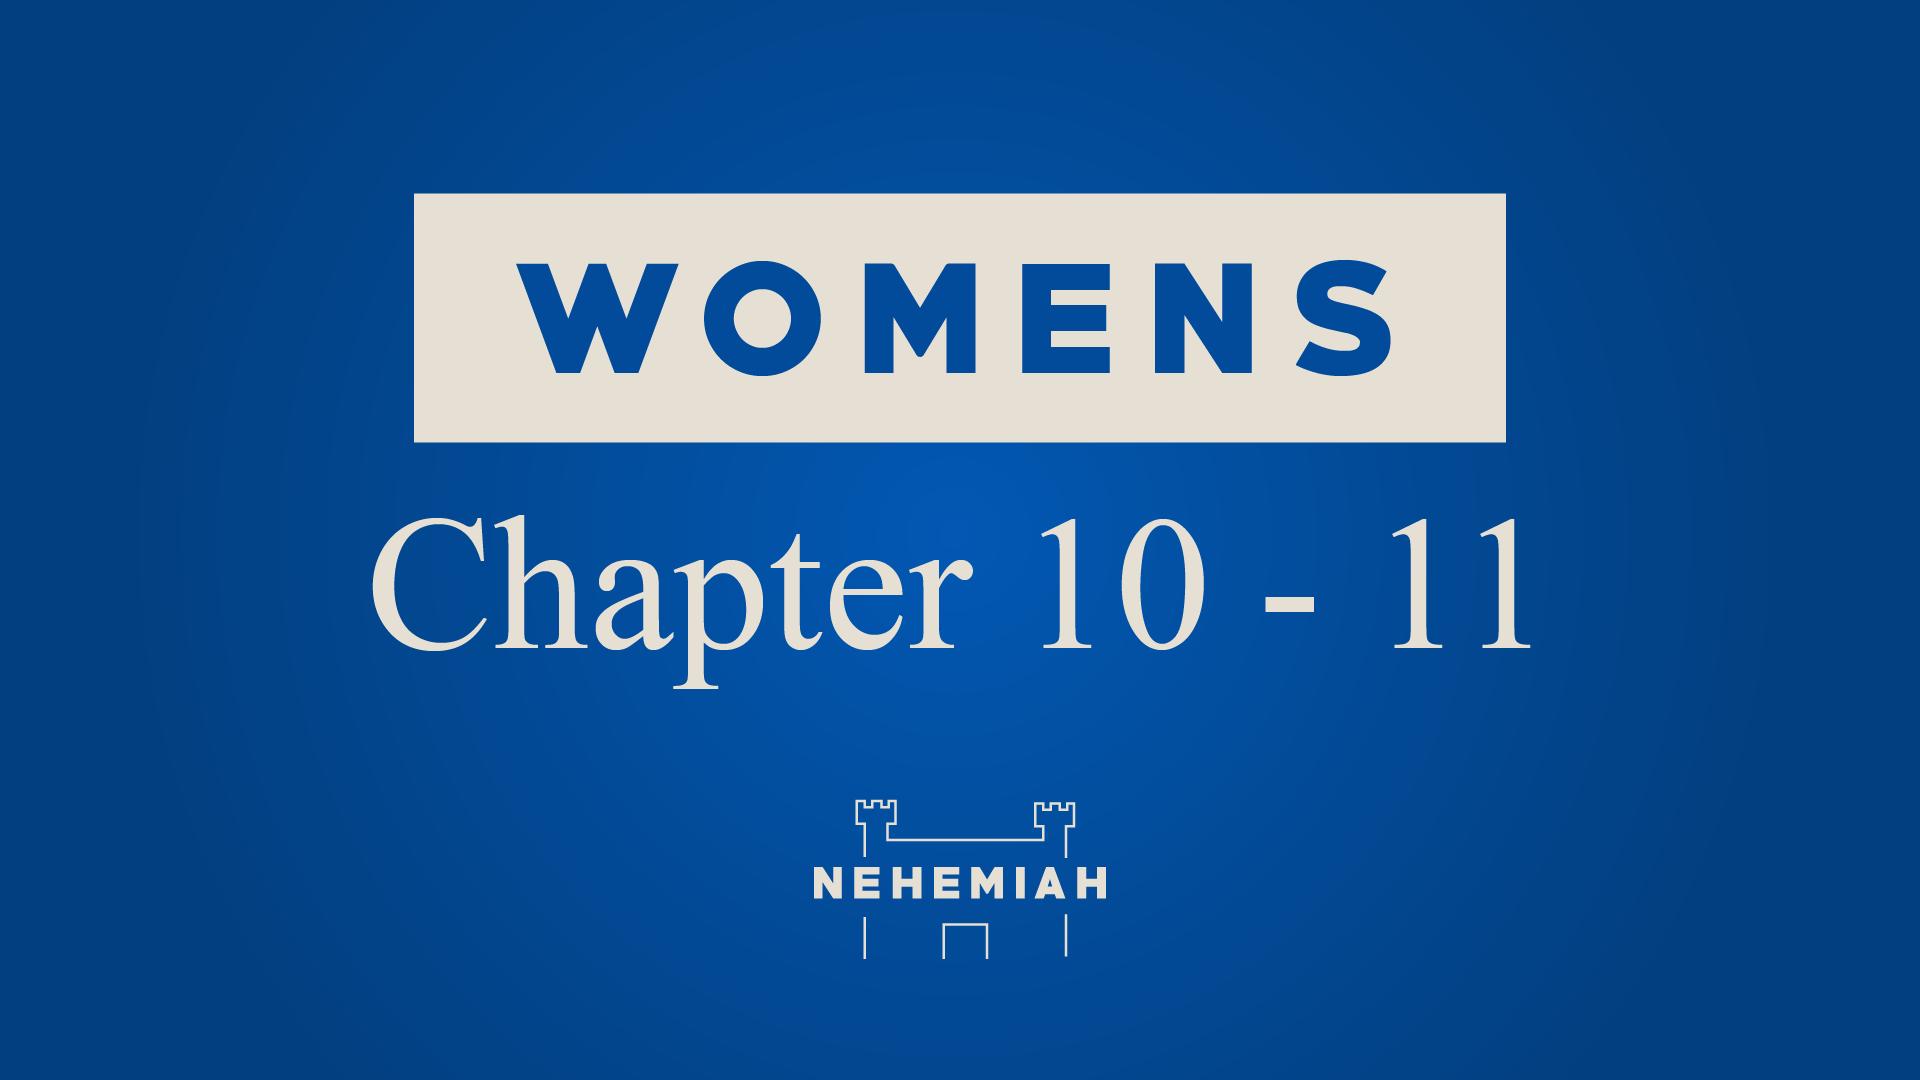 Nehemiah-BS_Women-10-11.png